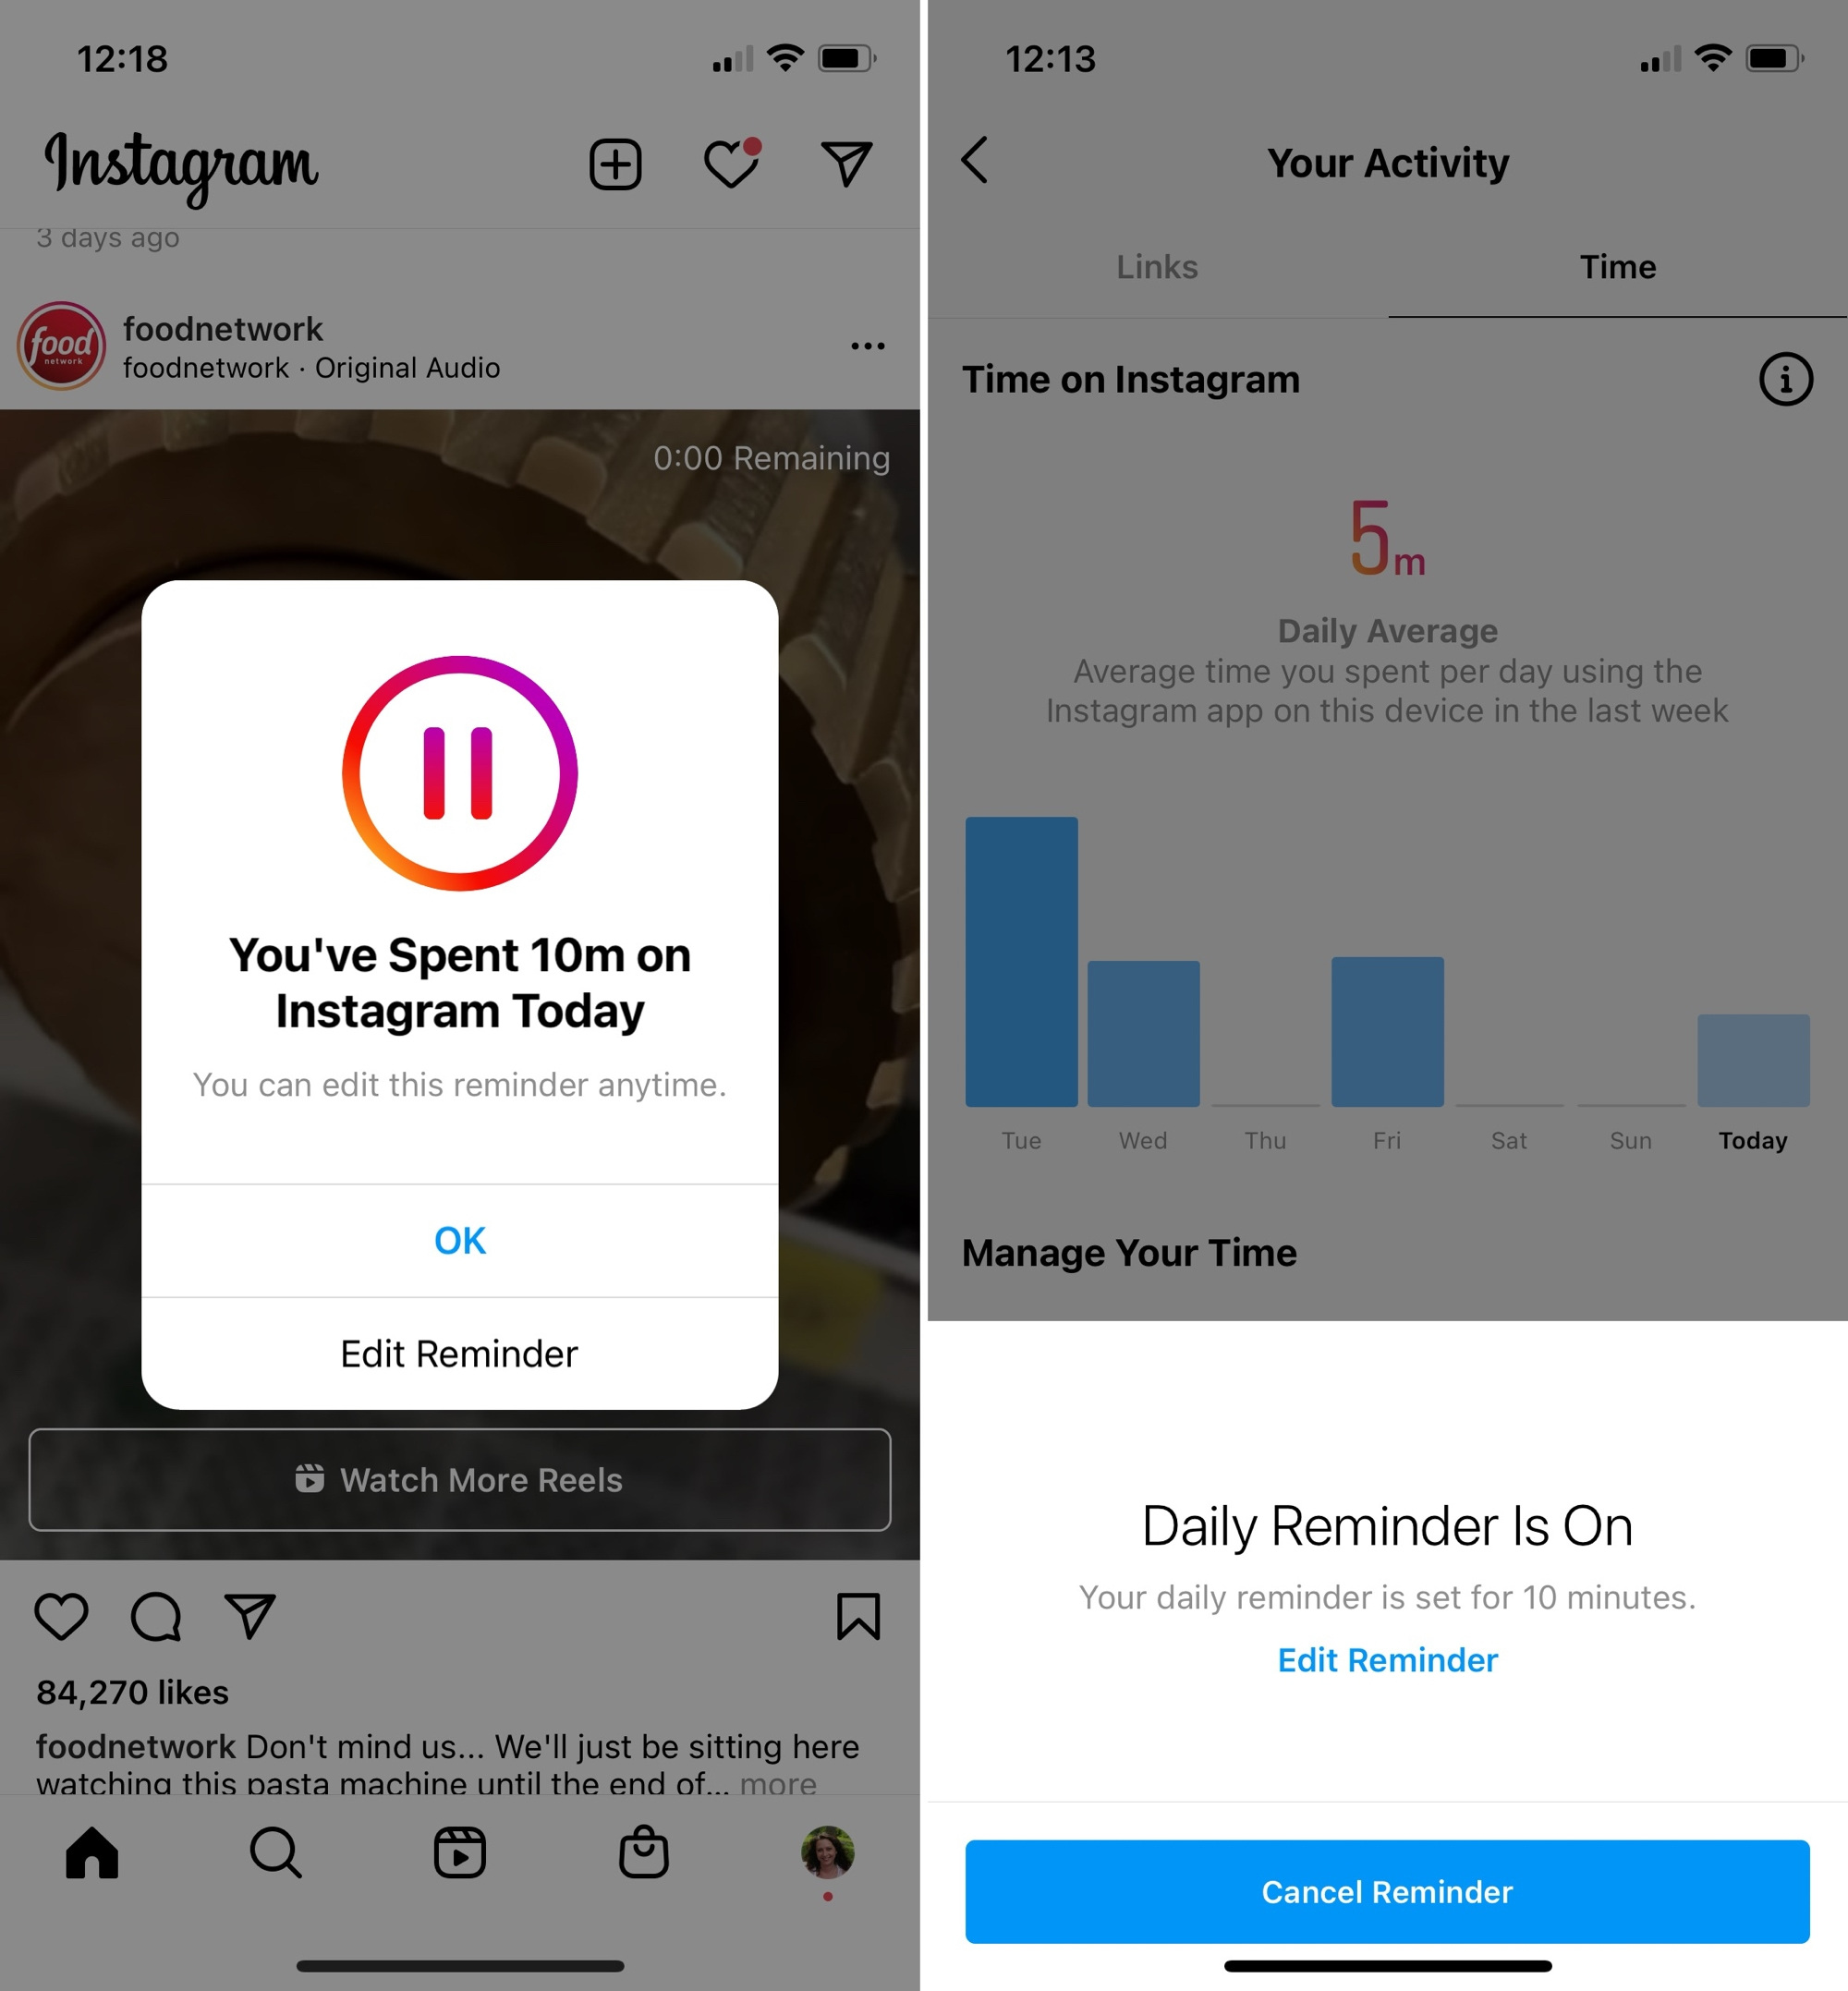 Instagram View Daily Reminder